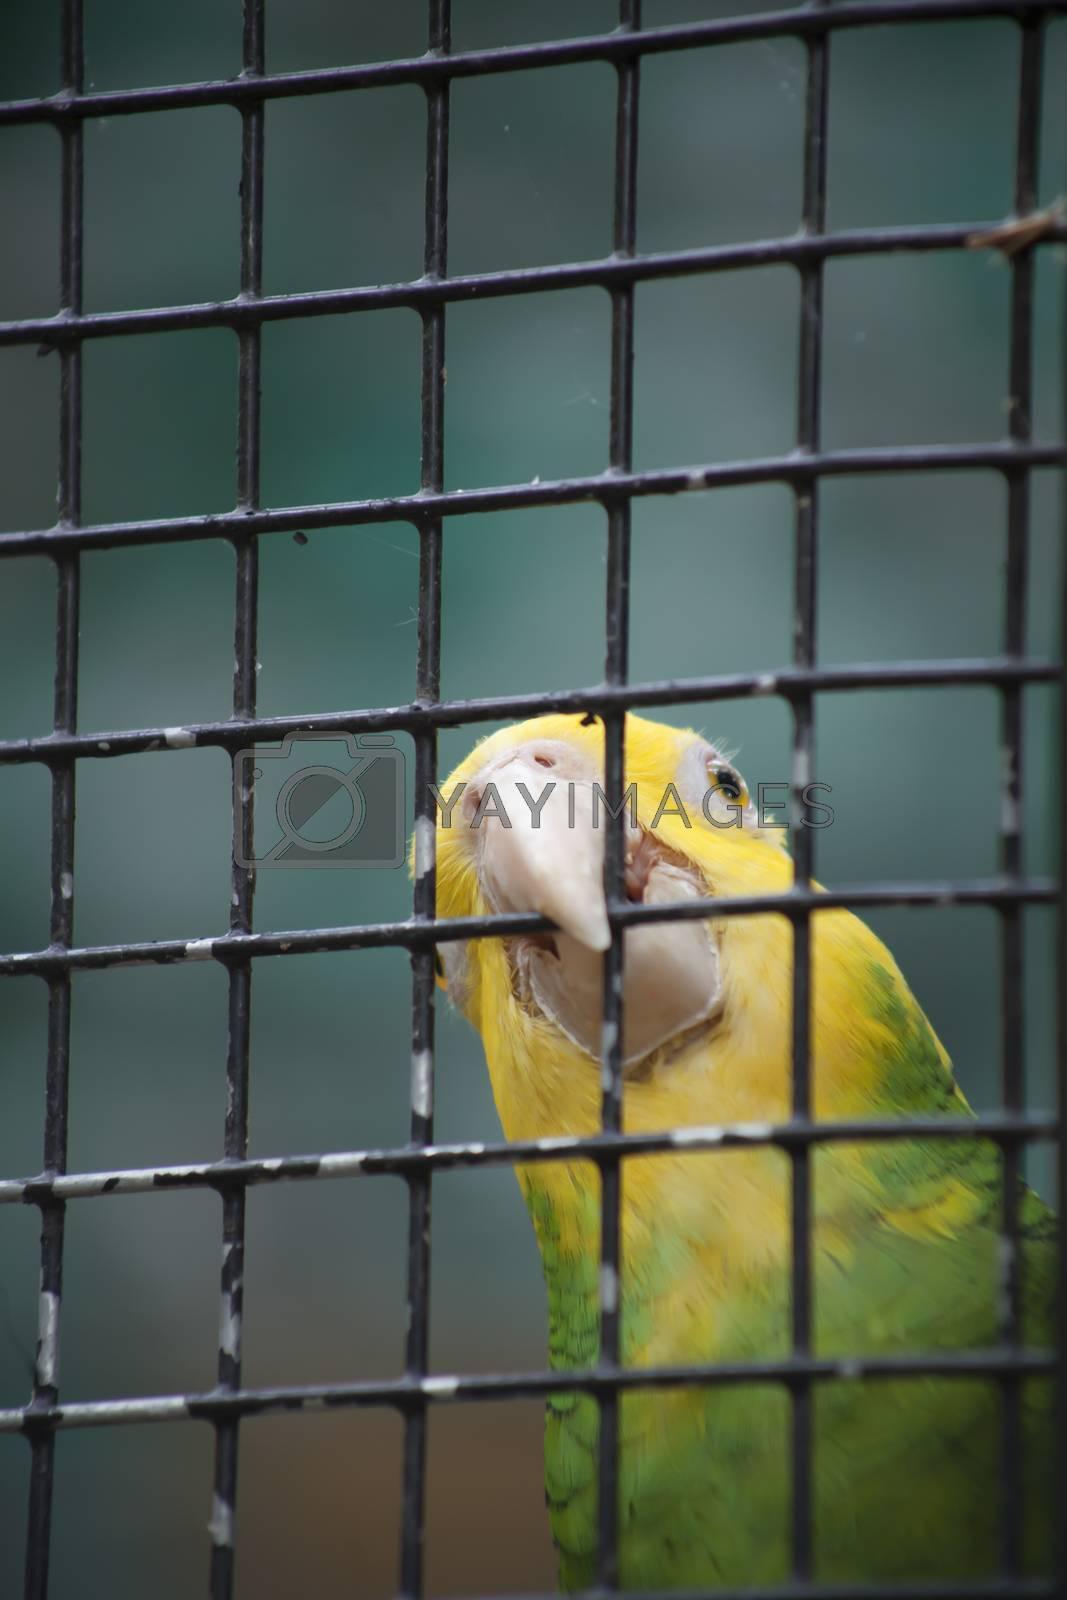 Close up of a sun conure, also known as a sun parakeet